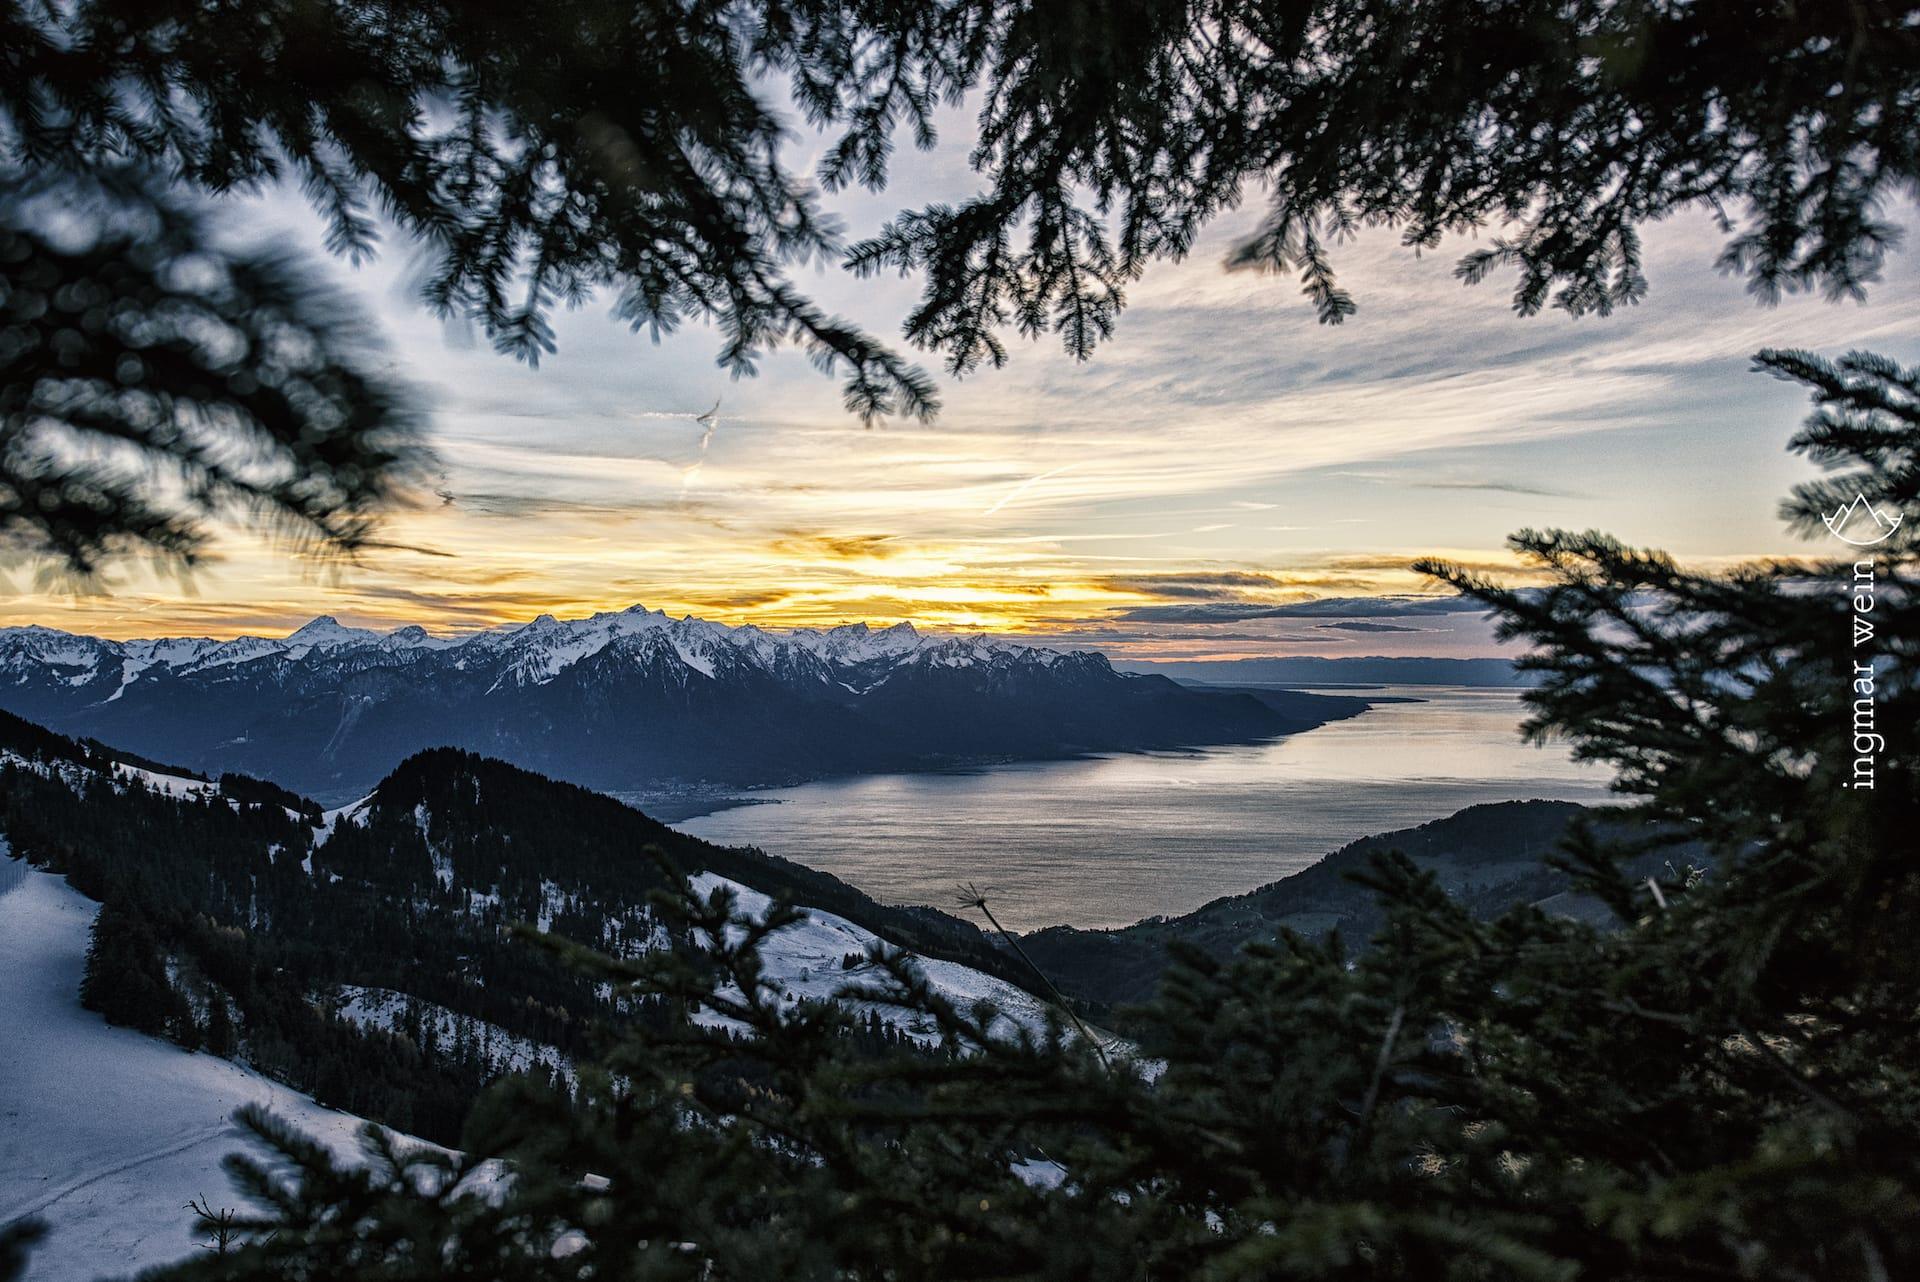 Travelling through Switzerland